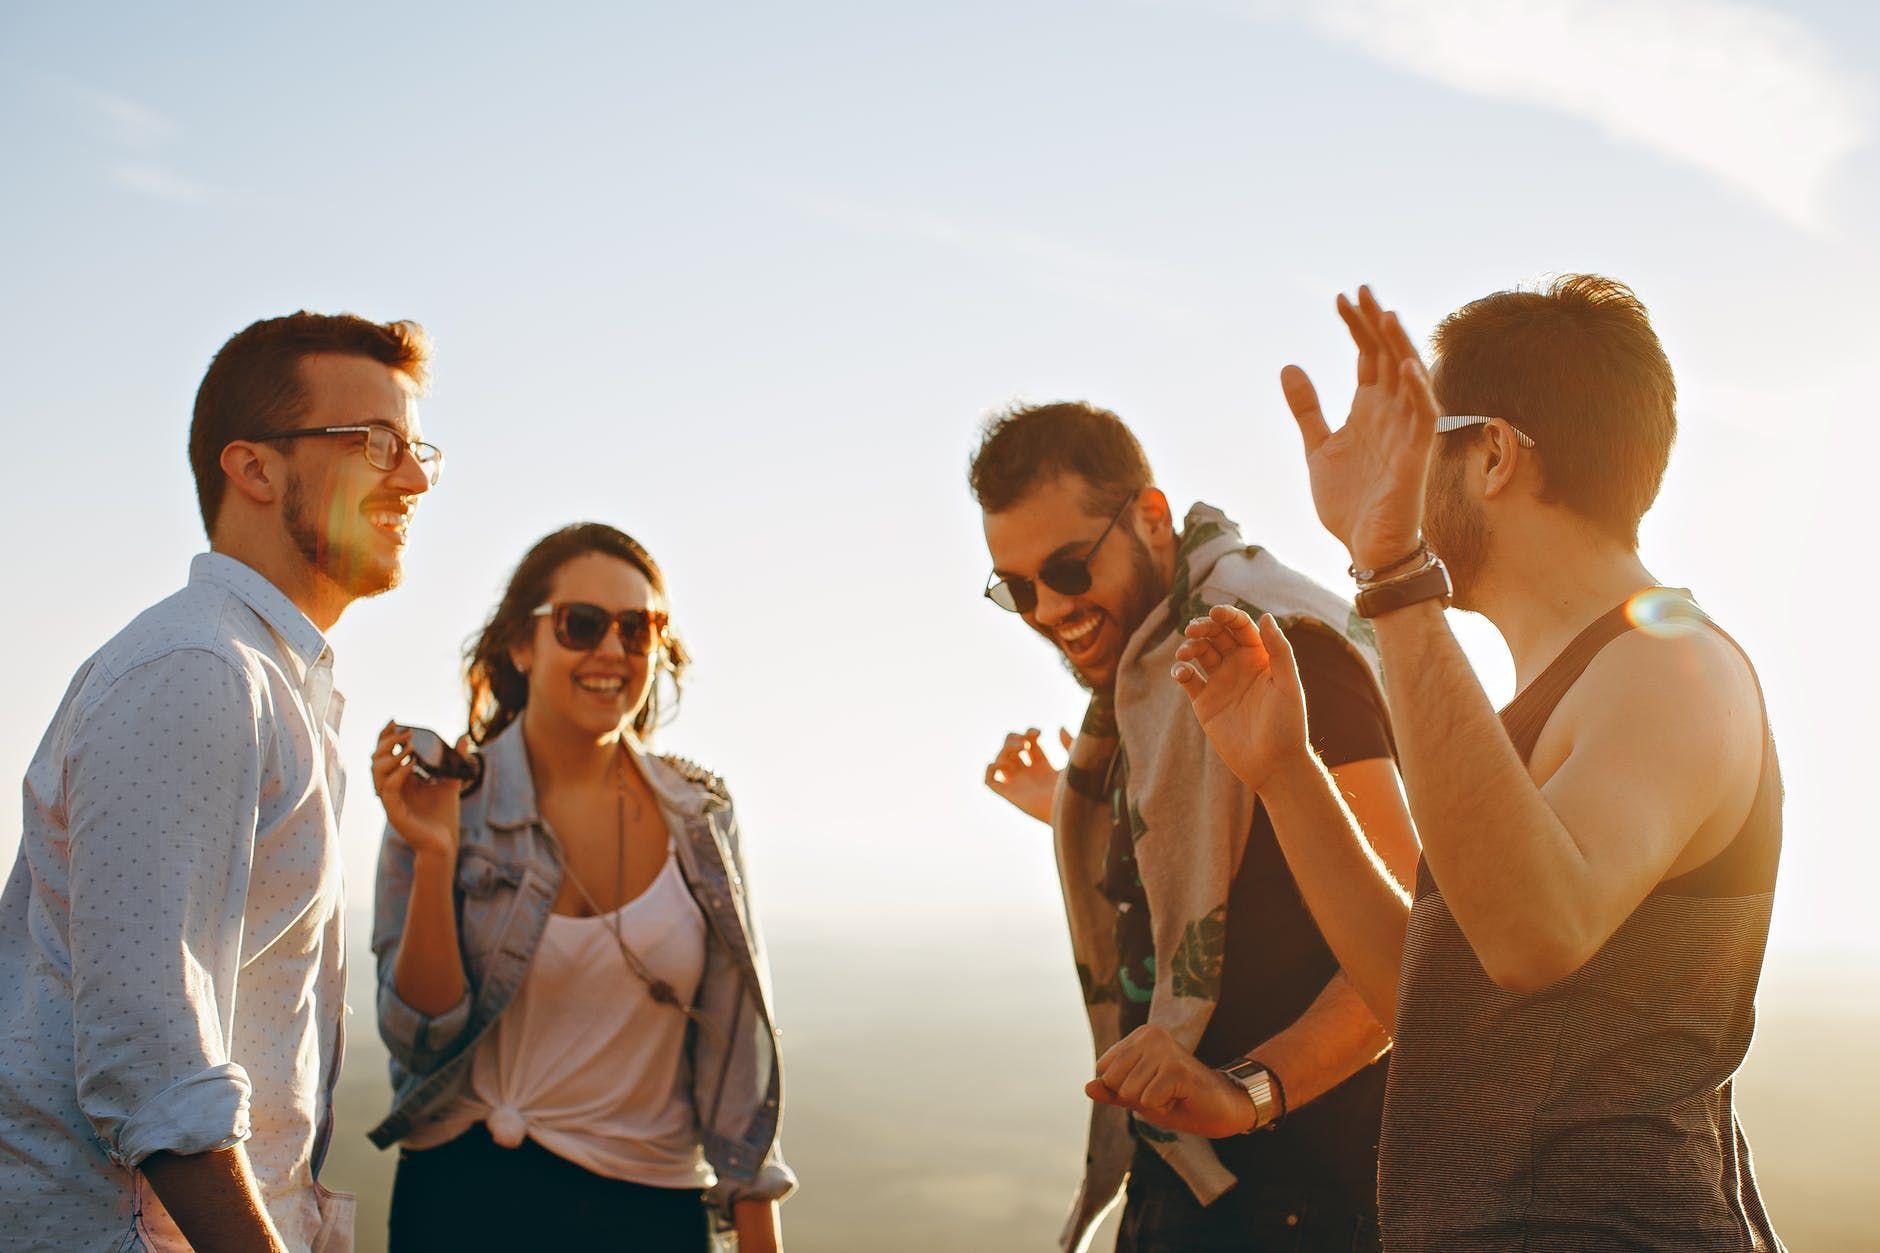 7 Hal Menyenangkan yang Dapat Kamu Lakukan Ketika Single